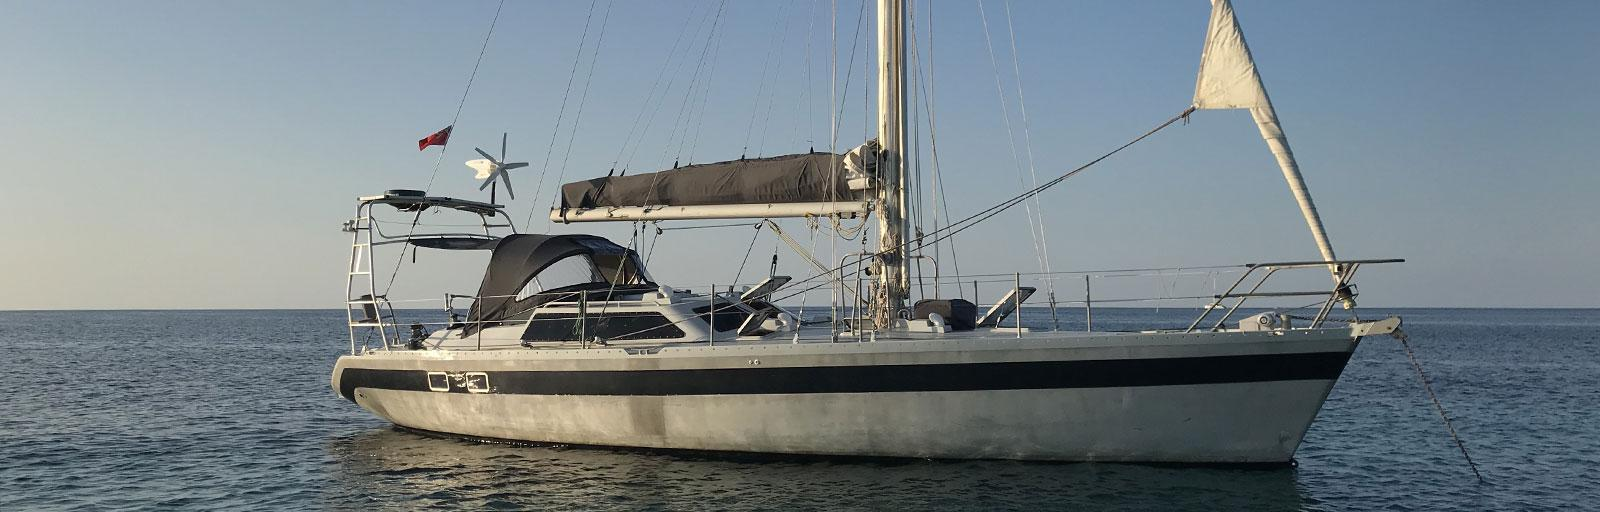 AYC Yachtbroker - Garcia Nouanni 47